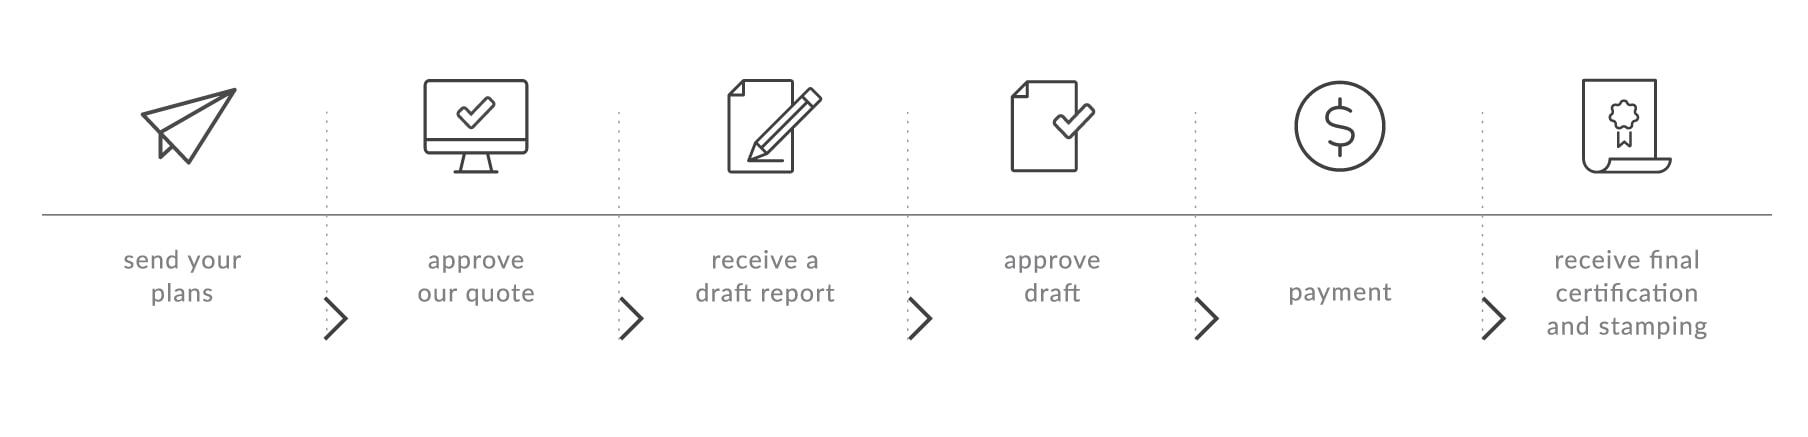 Basix certificate process